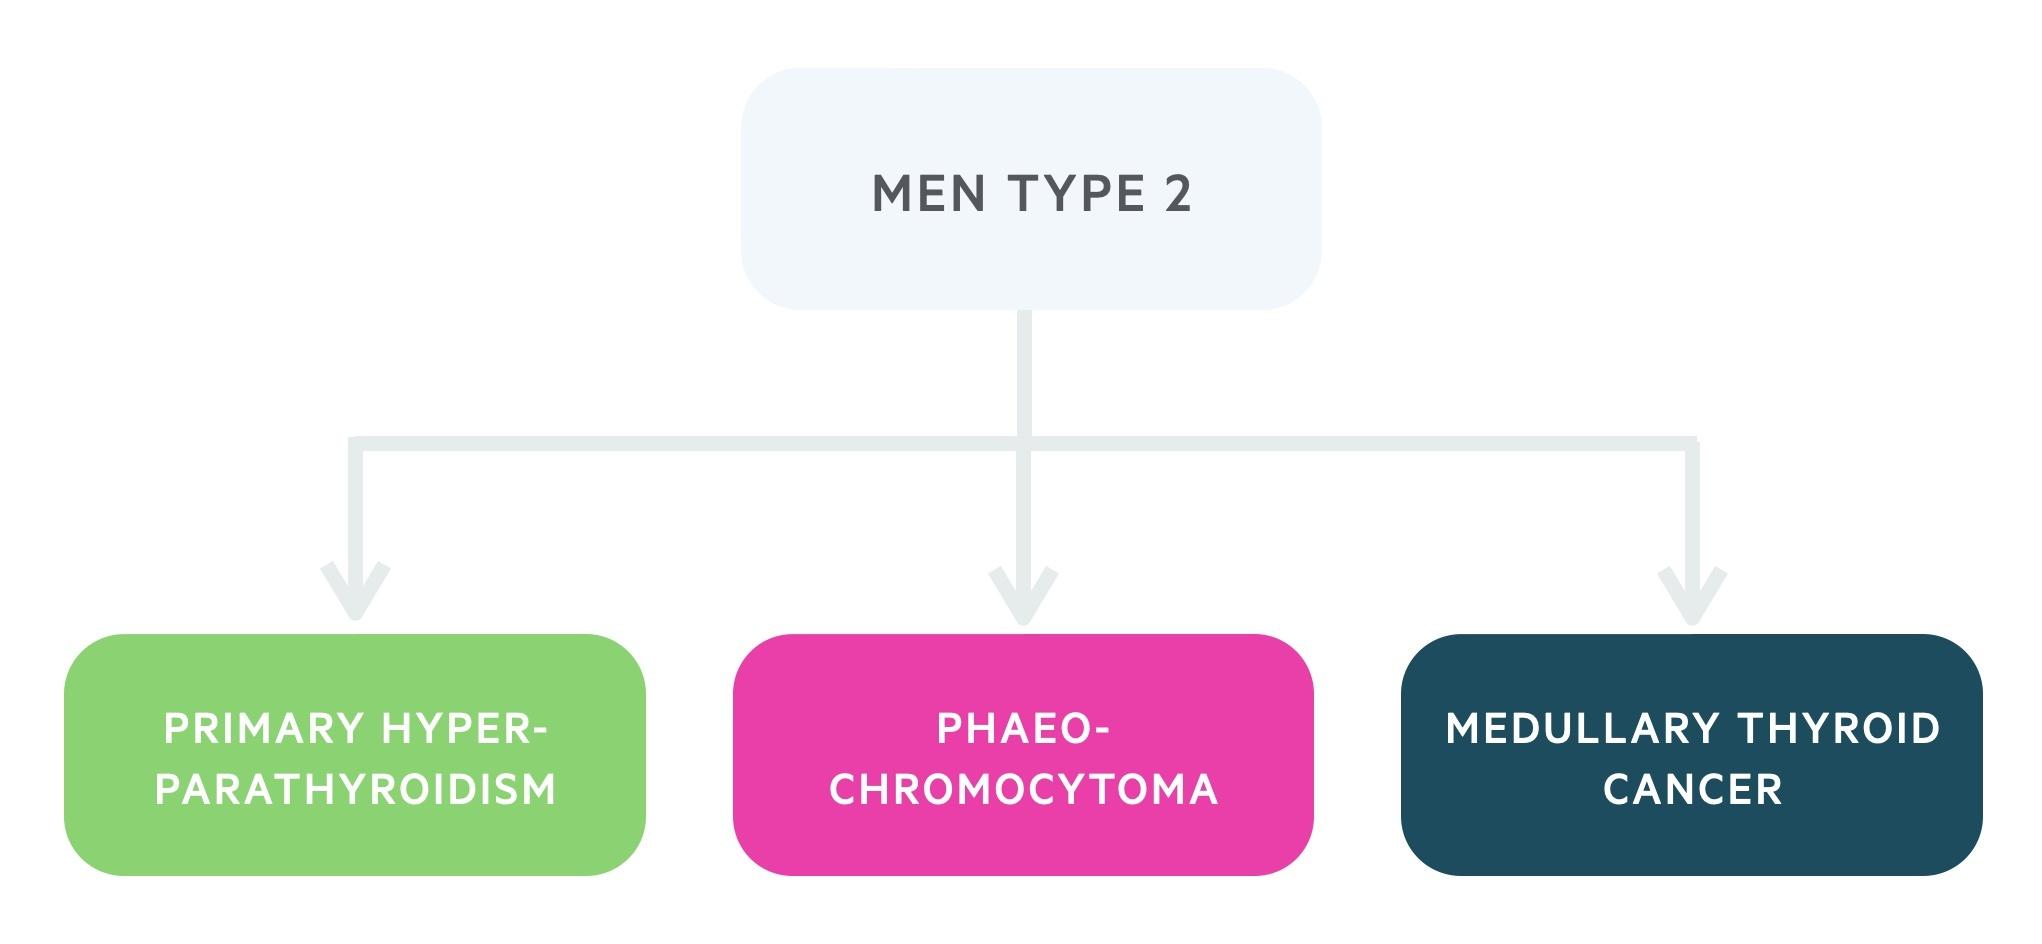 Manifestations of MEN type 2